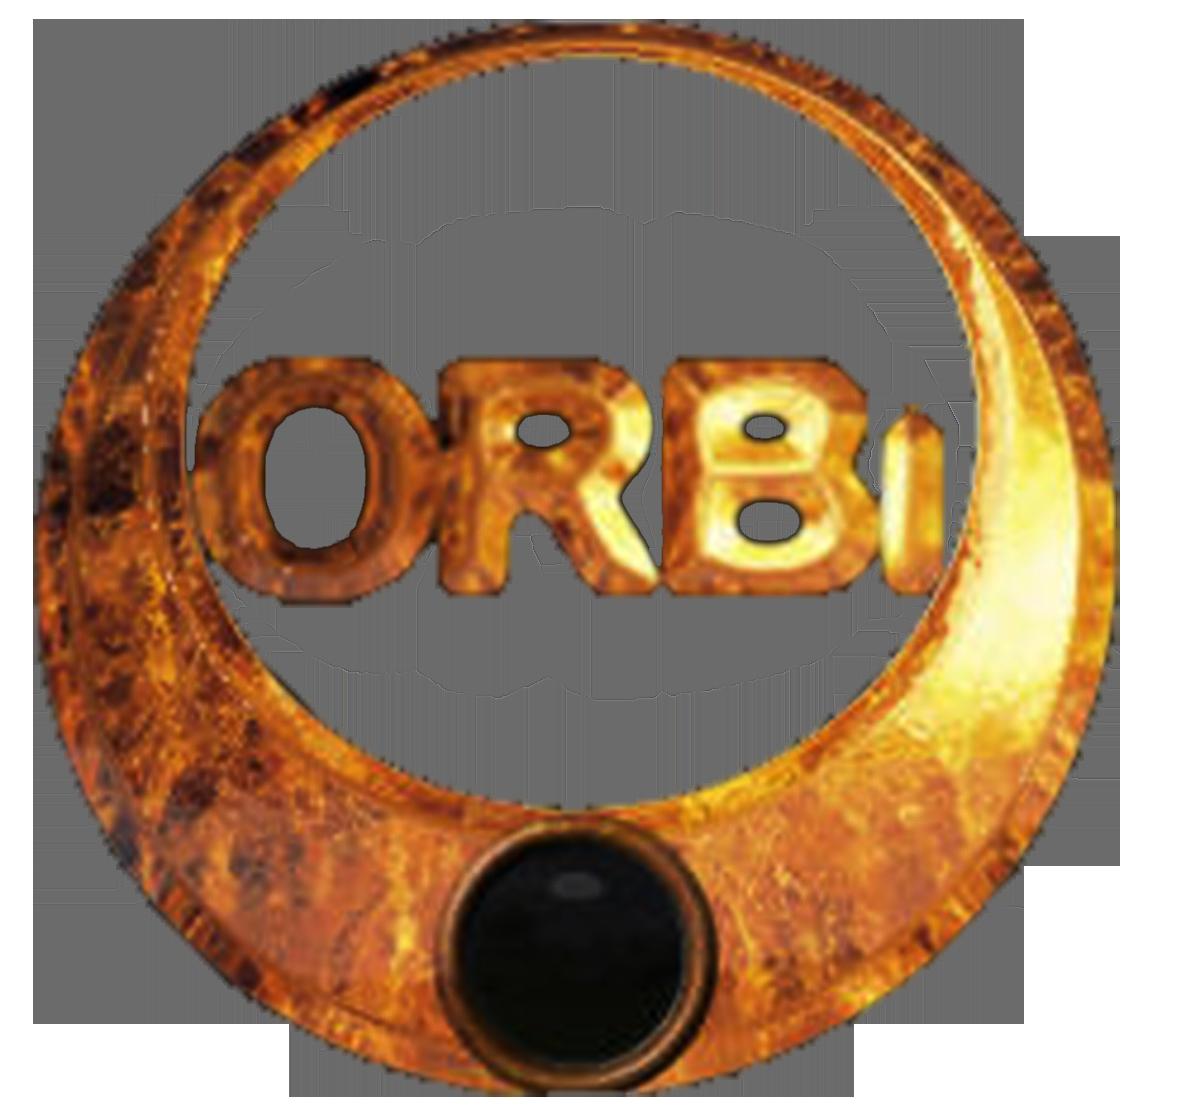 ORBI orgia swinger Parejas sexo en grupo Bi Travesti